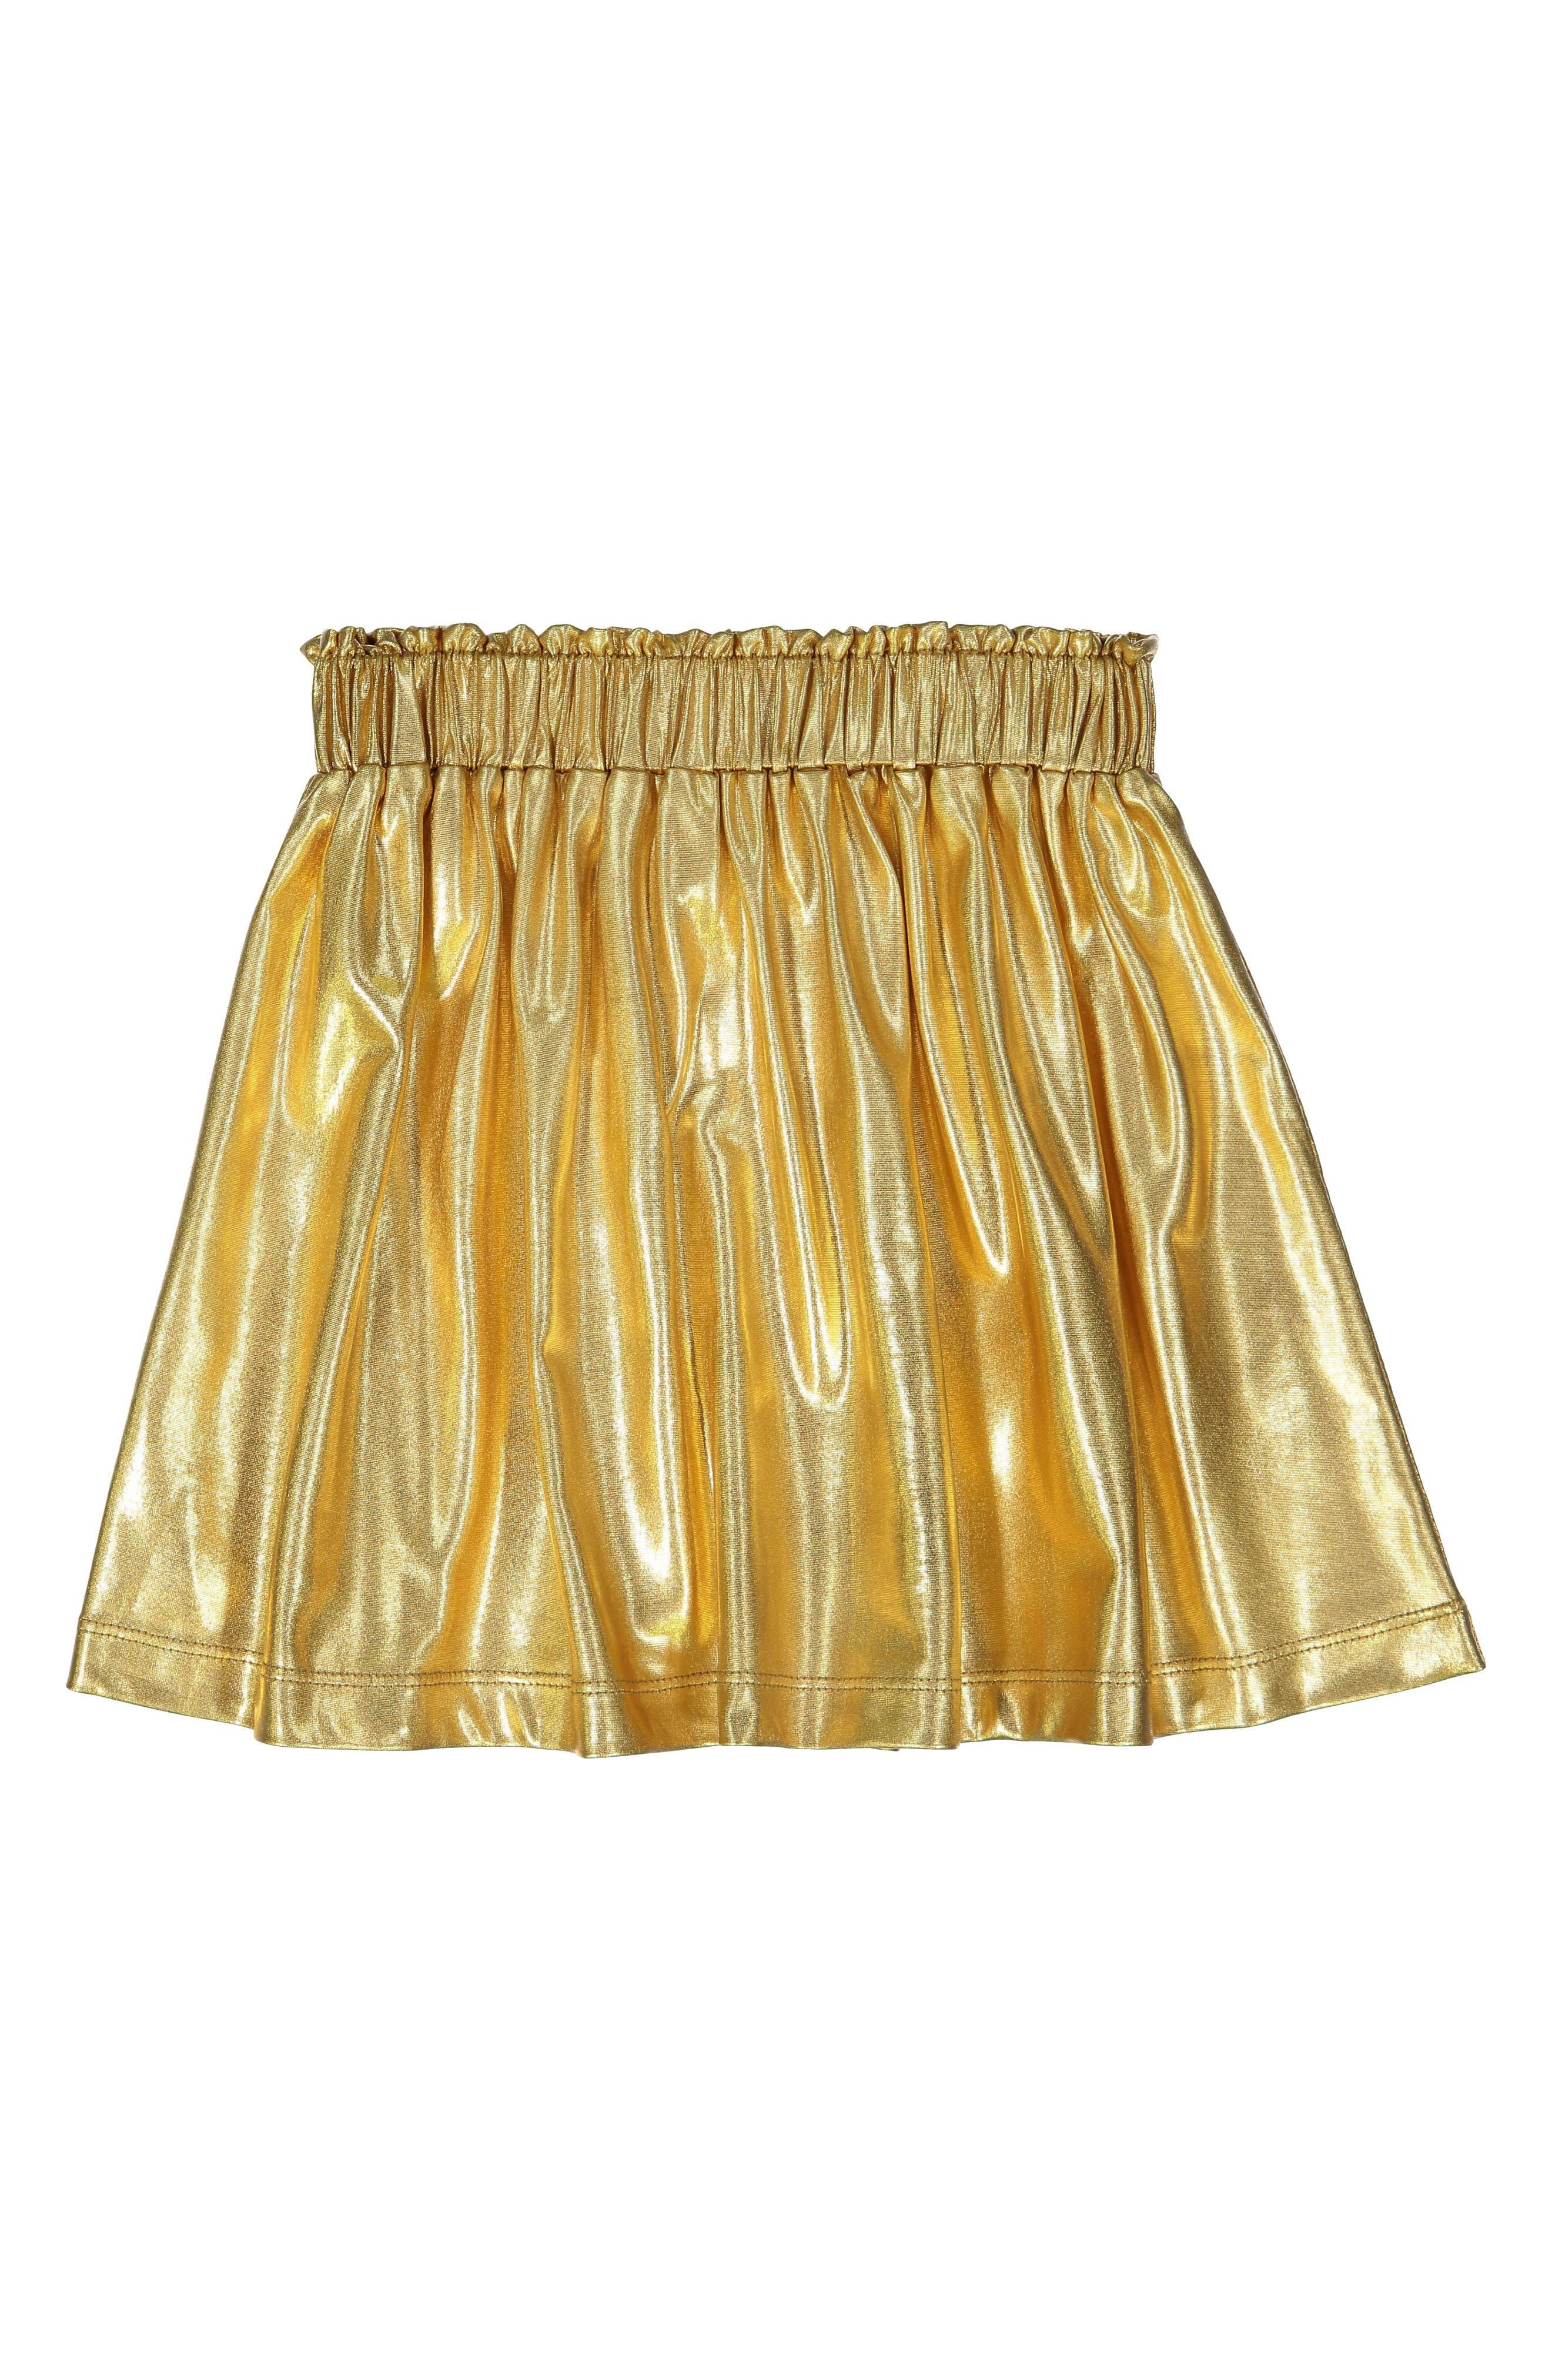 Gold Metallic Skirt,                         Main,                         color, GOLD